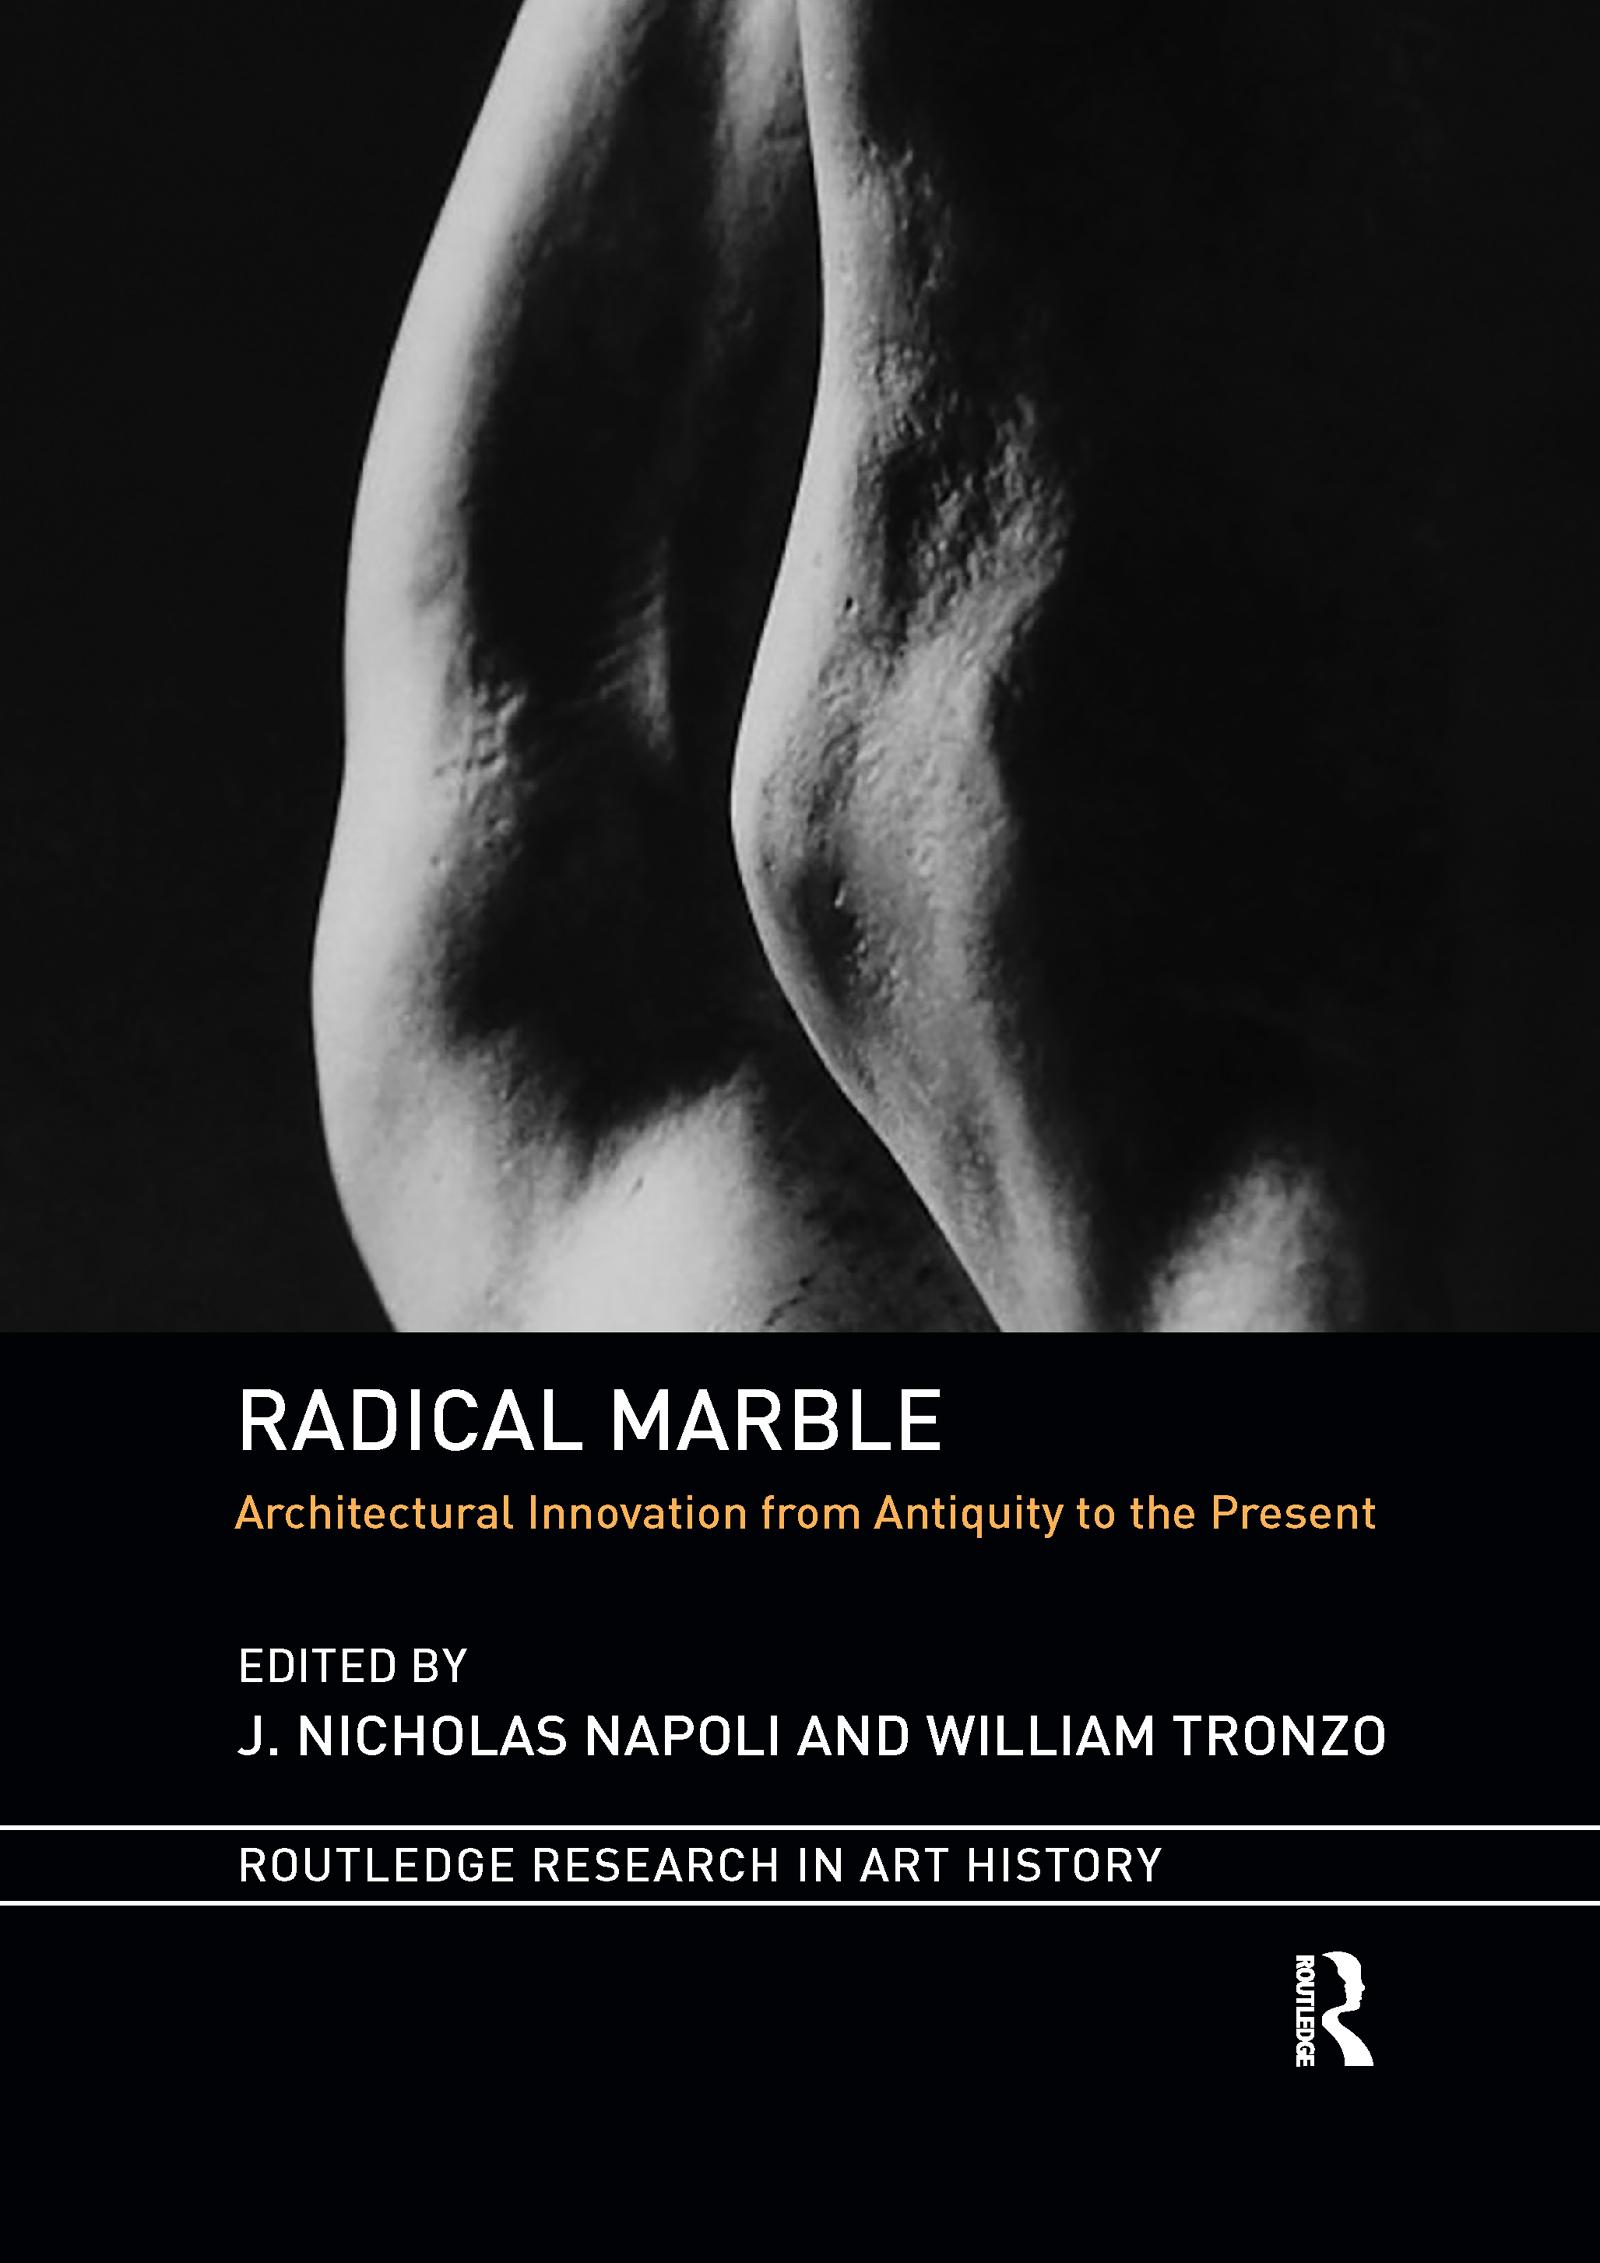 Radical Marble